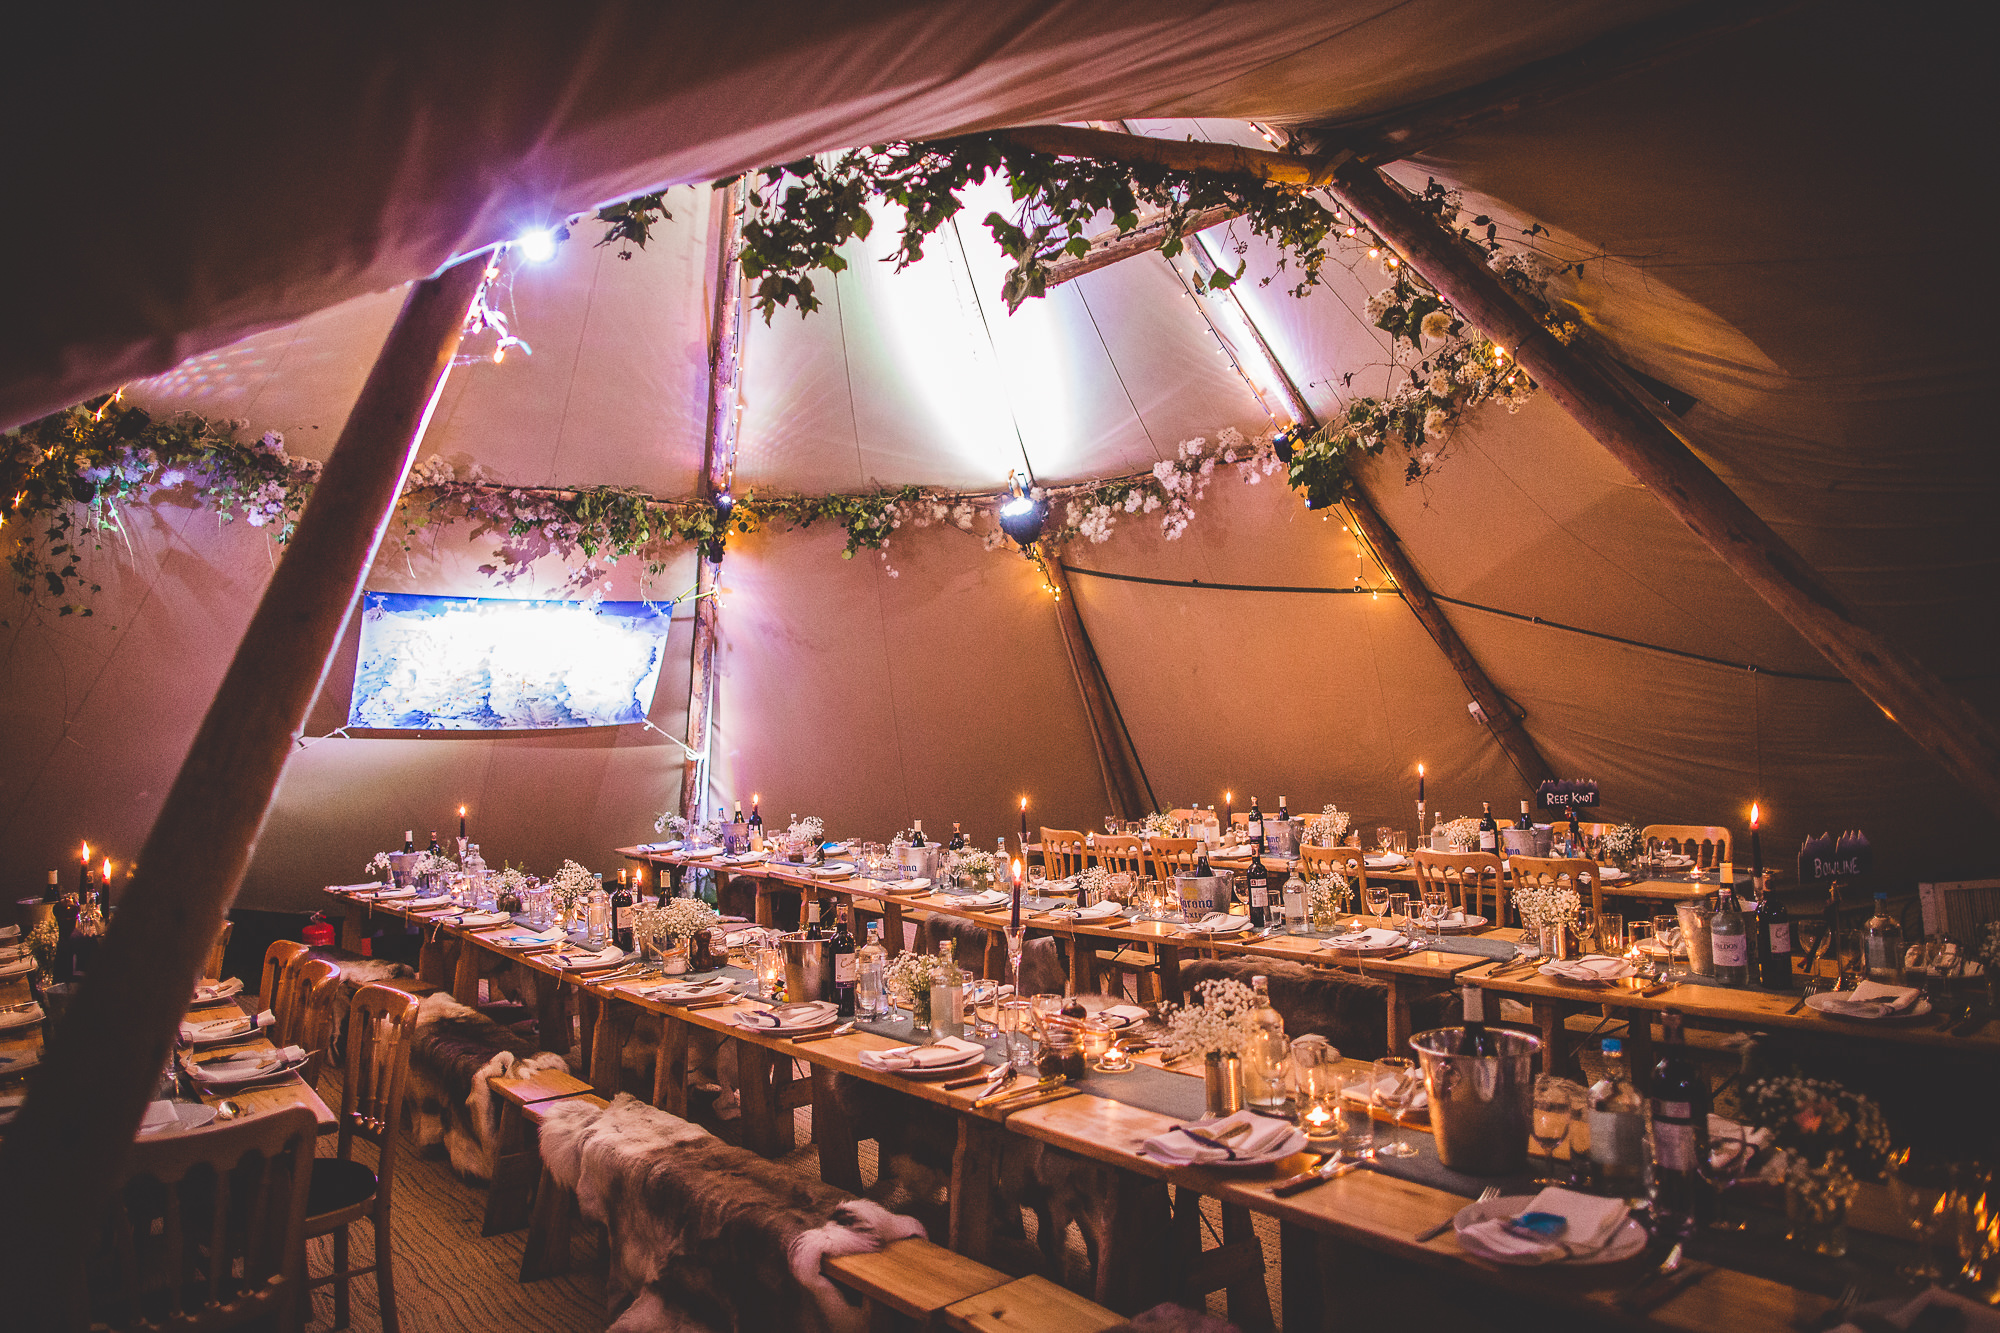 Garden Tipi Wedding | Tobina & Franny Tobina Blog 053